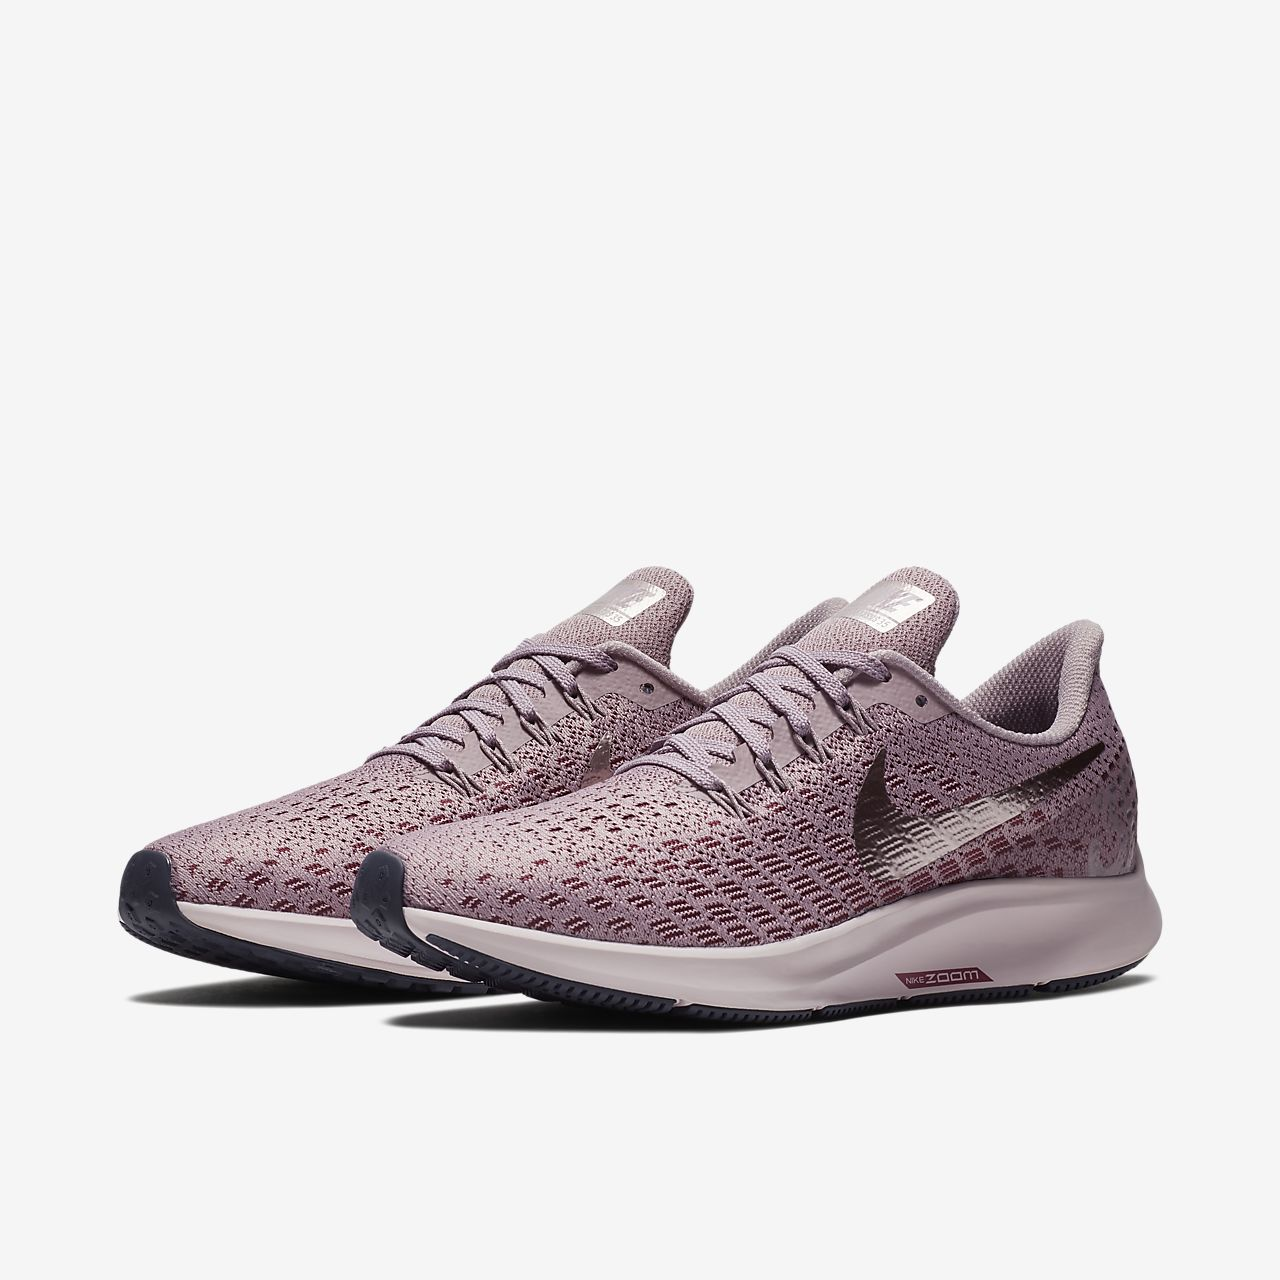 166049d1052a7 Nike Air Zoom Pegasus 35 Women s Running Shoe. Nike.com PT